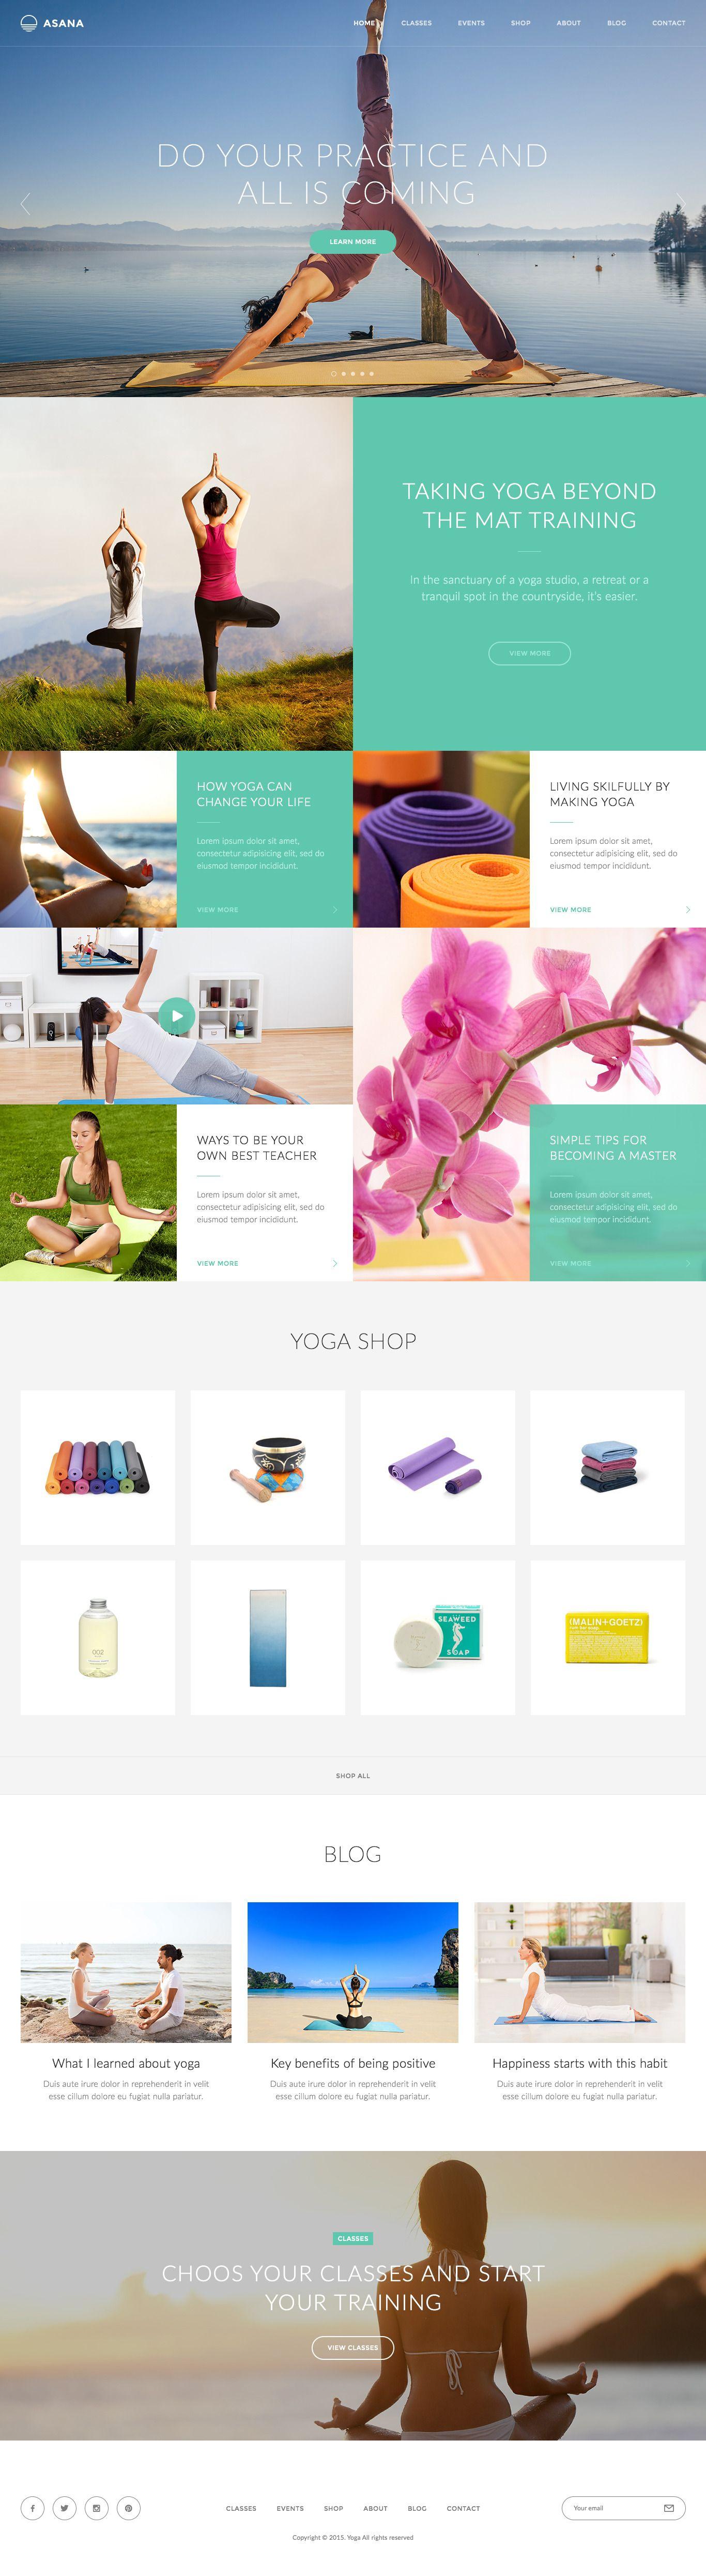 Asana - Sport and Yoga PSD Template | YOGA WEBSITE | Pinterest ...